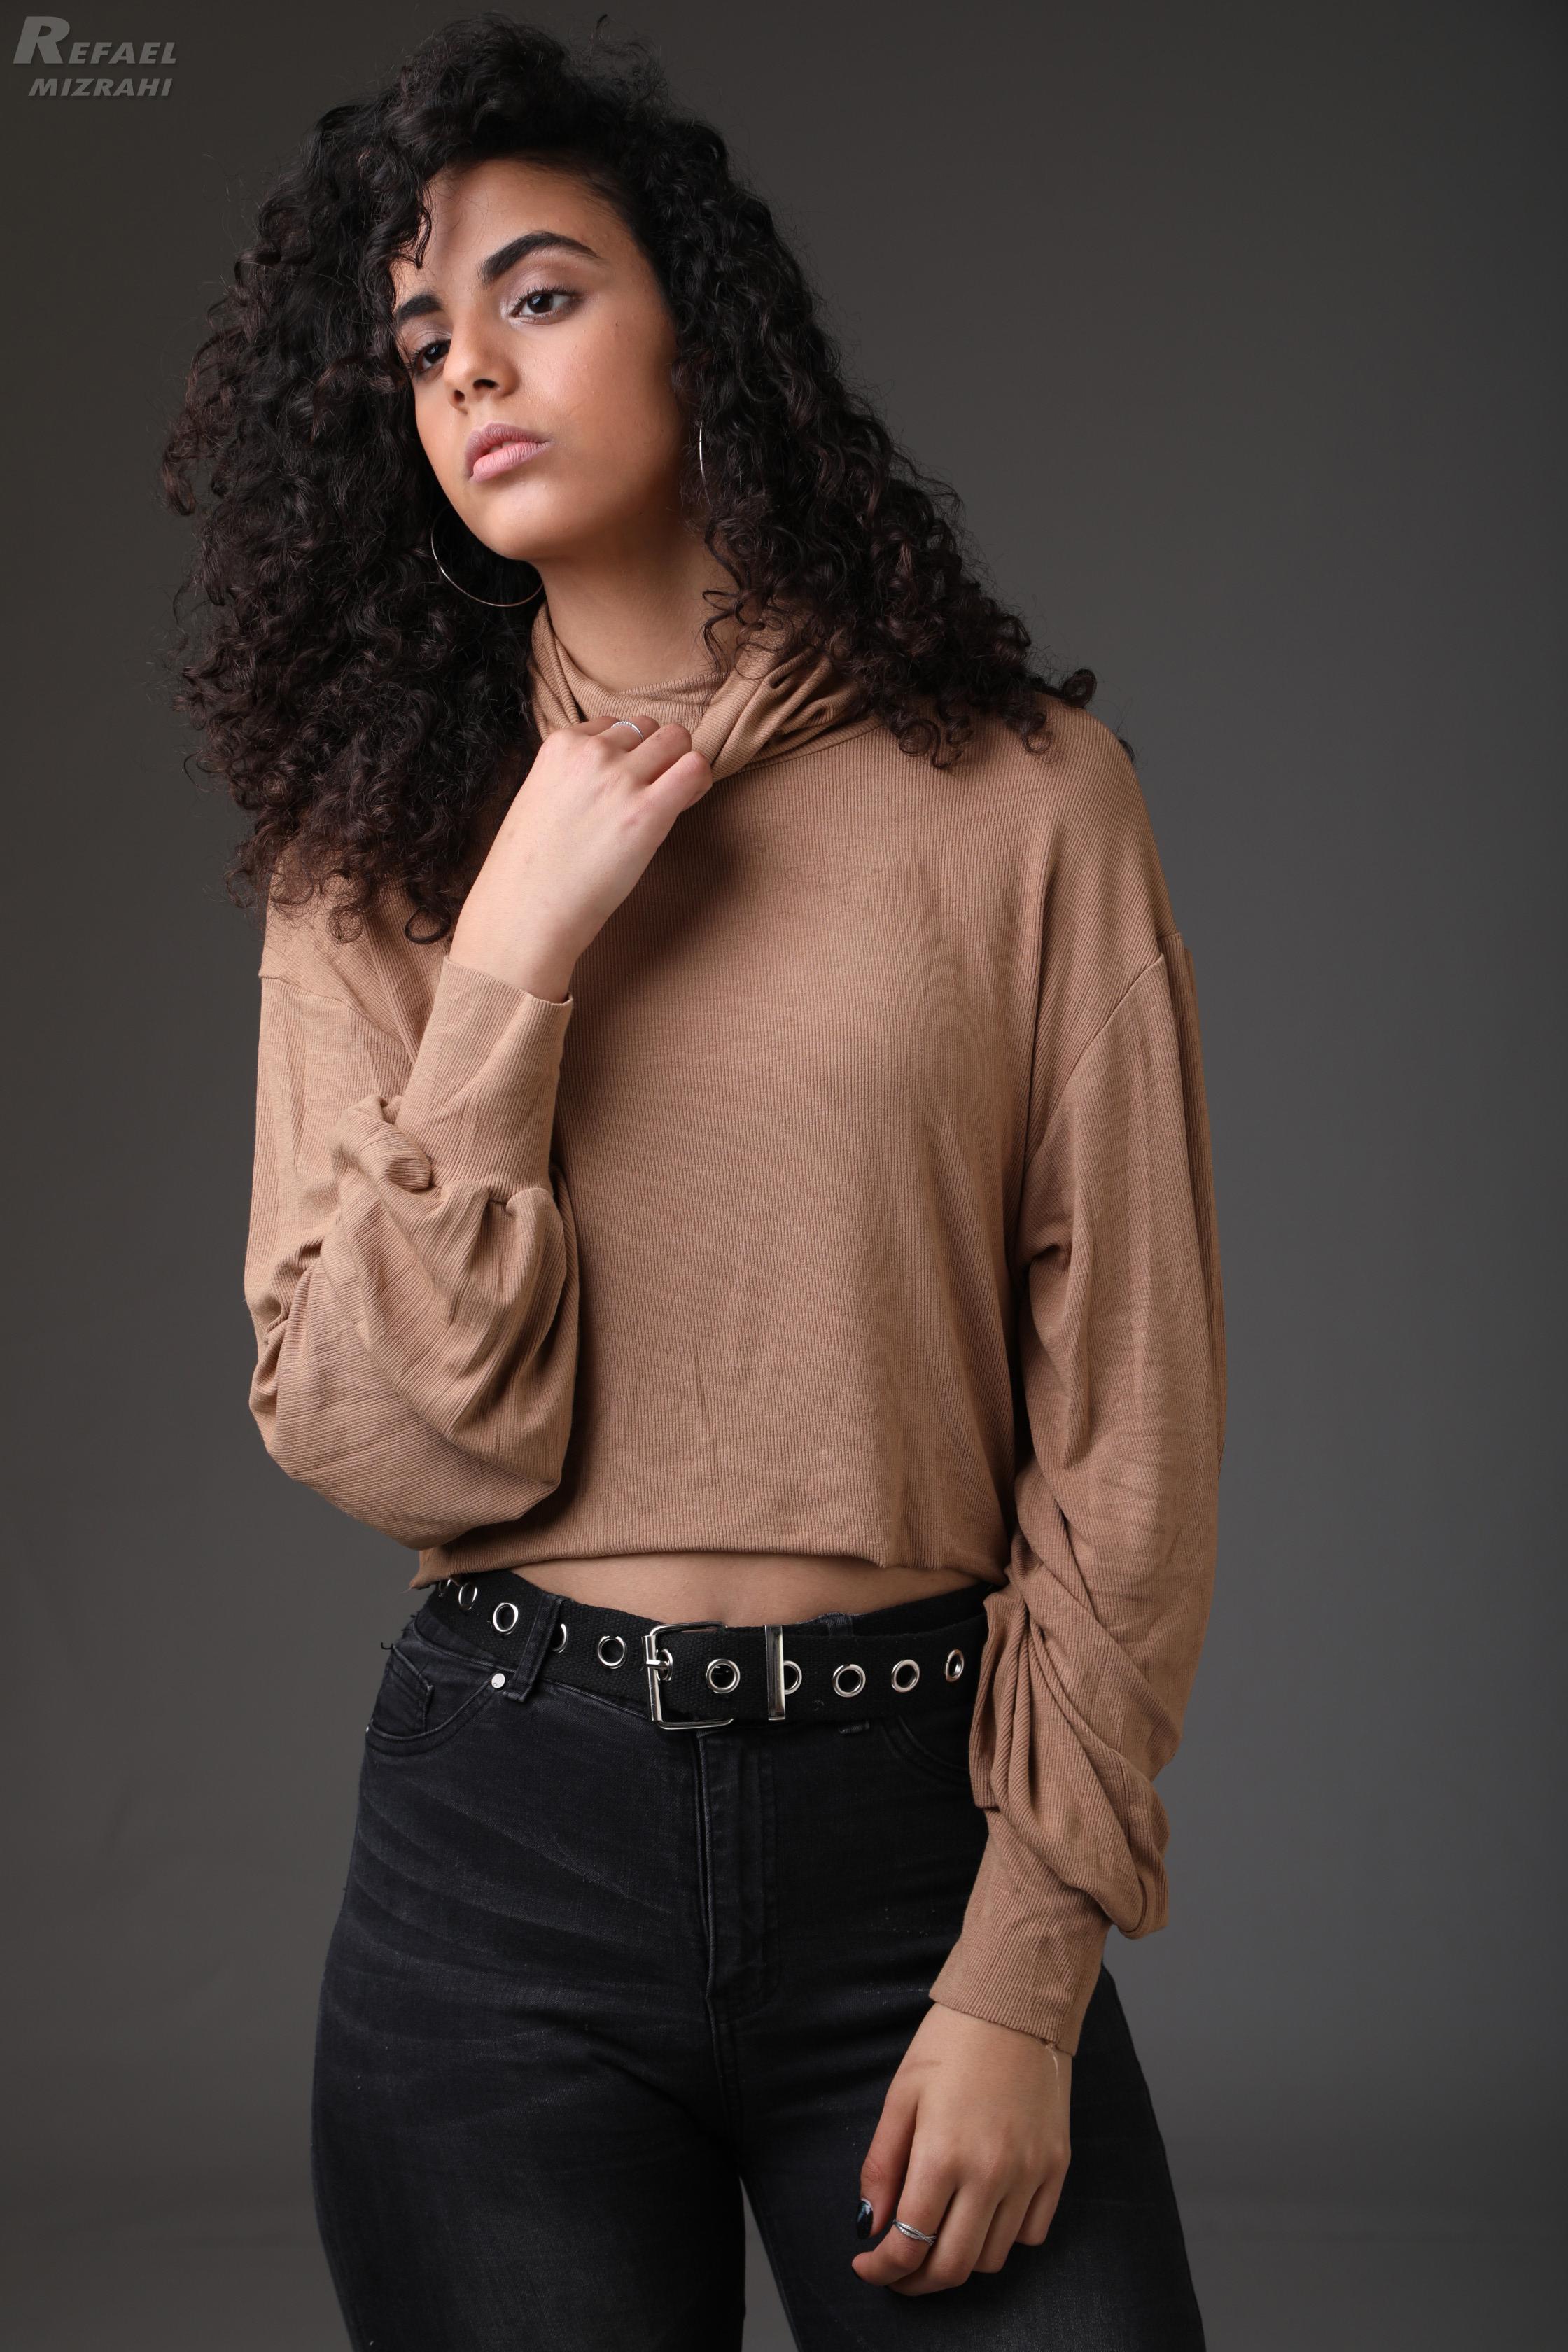 Refael Mizrahi Fashion Photography (1175